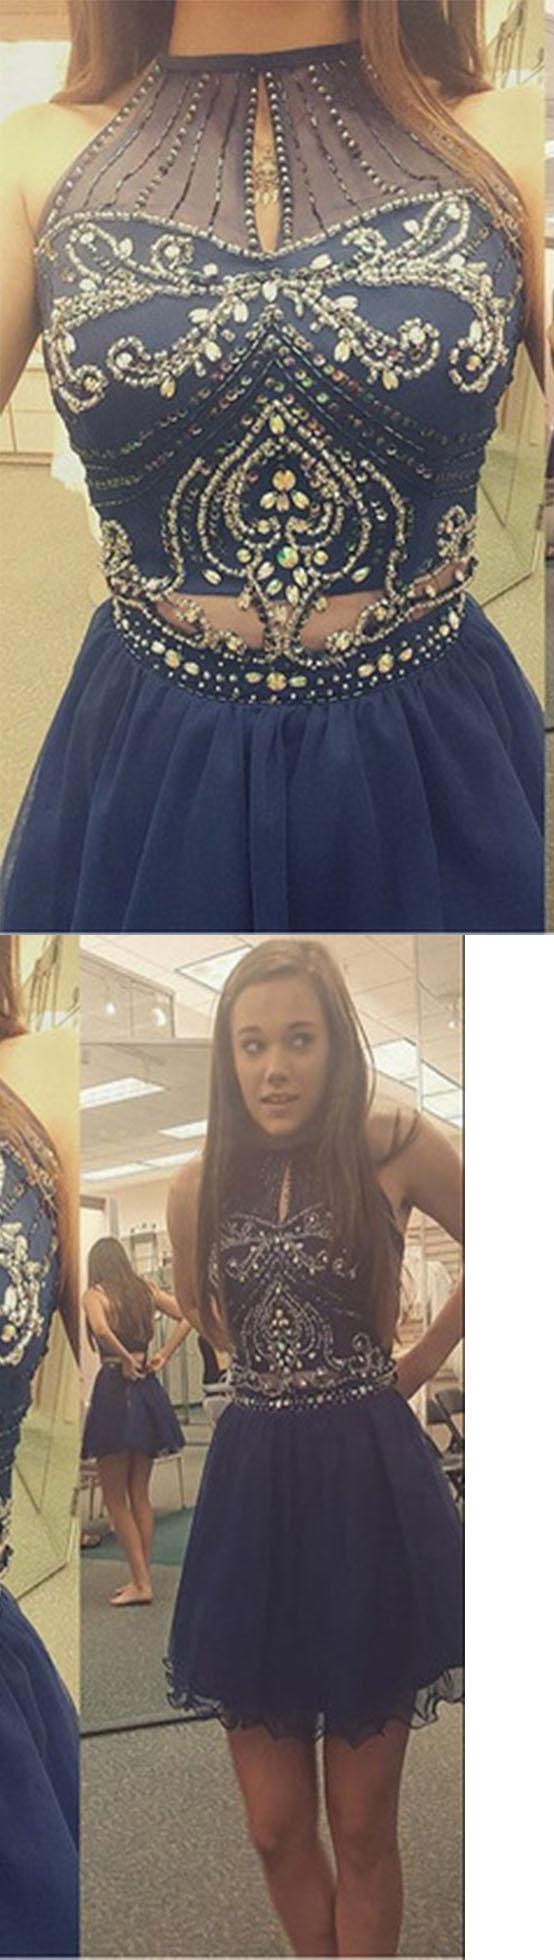 Prom dresshigh neck halter navy tulle skirt two piece short prom